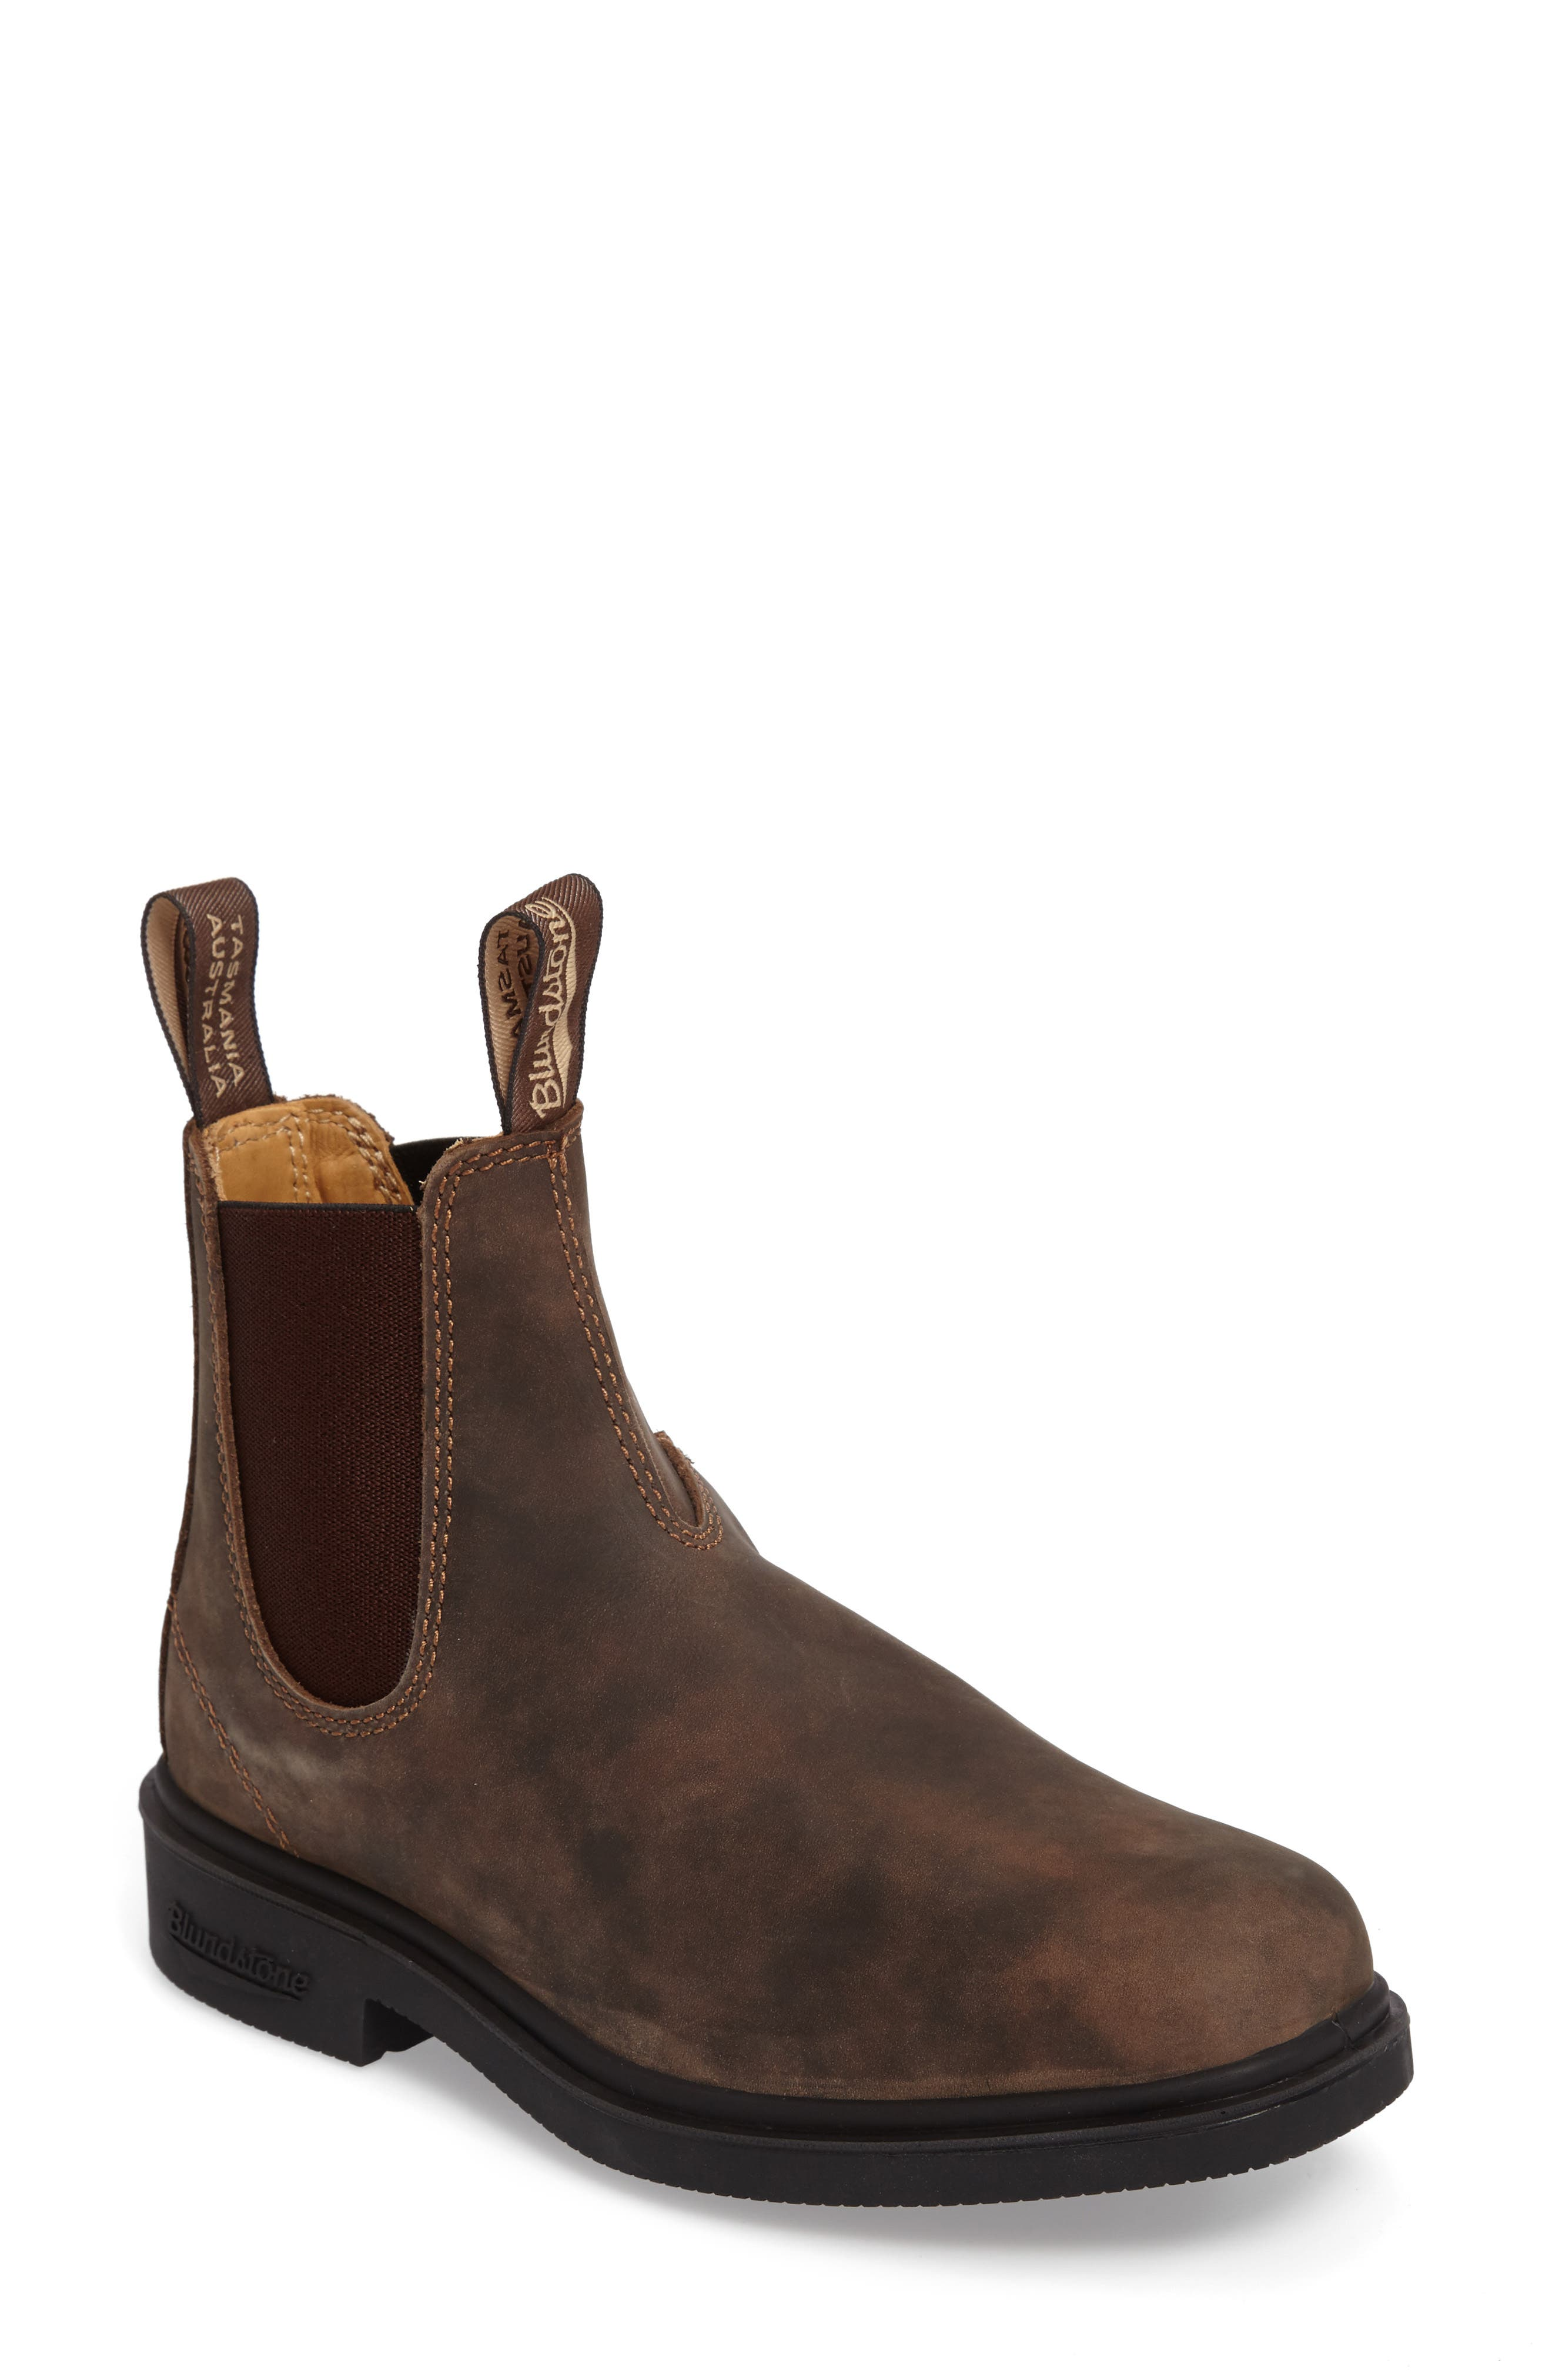 Blundstone Footwear Chelsea Boot, Metallic